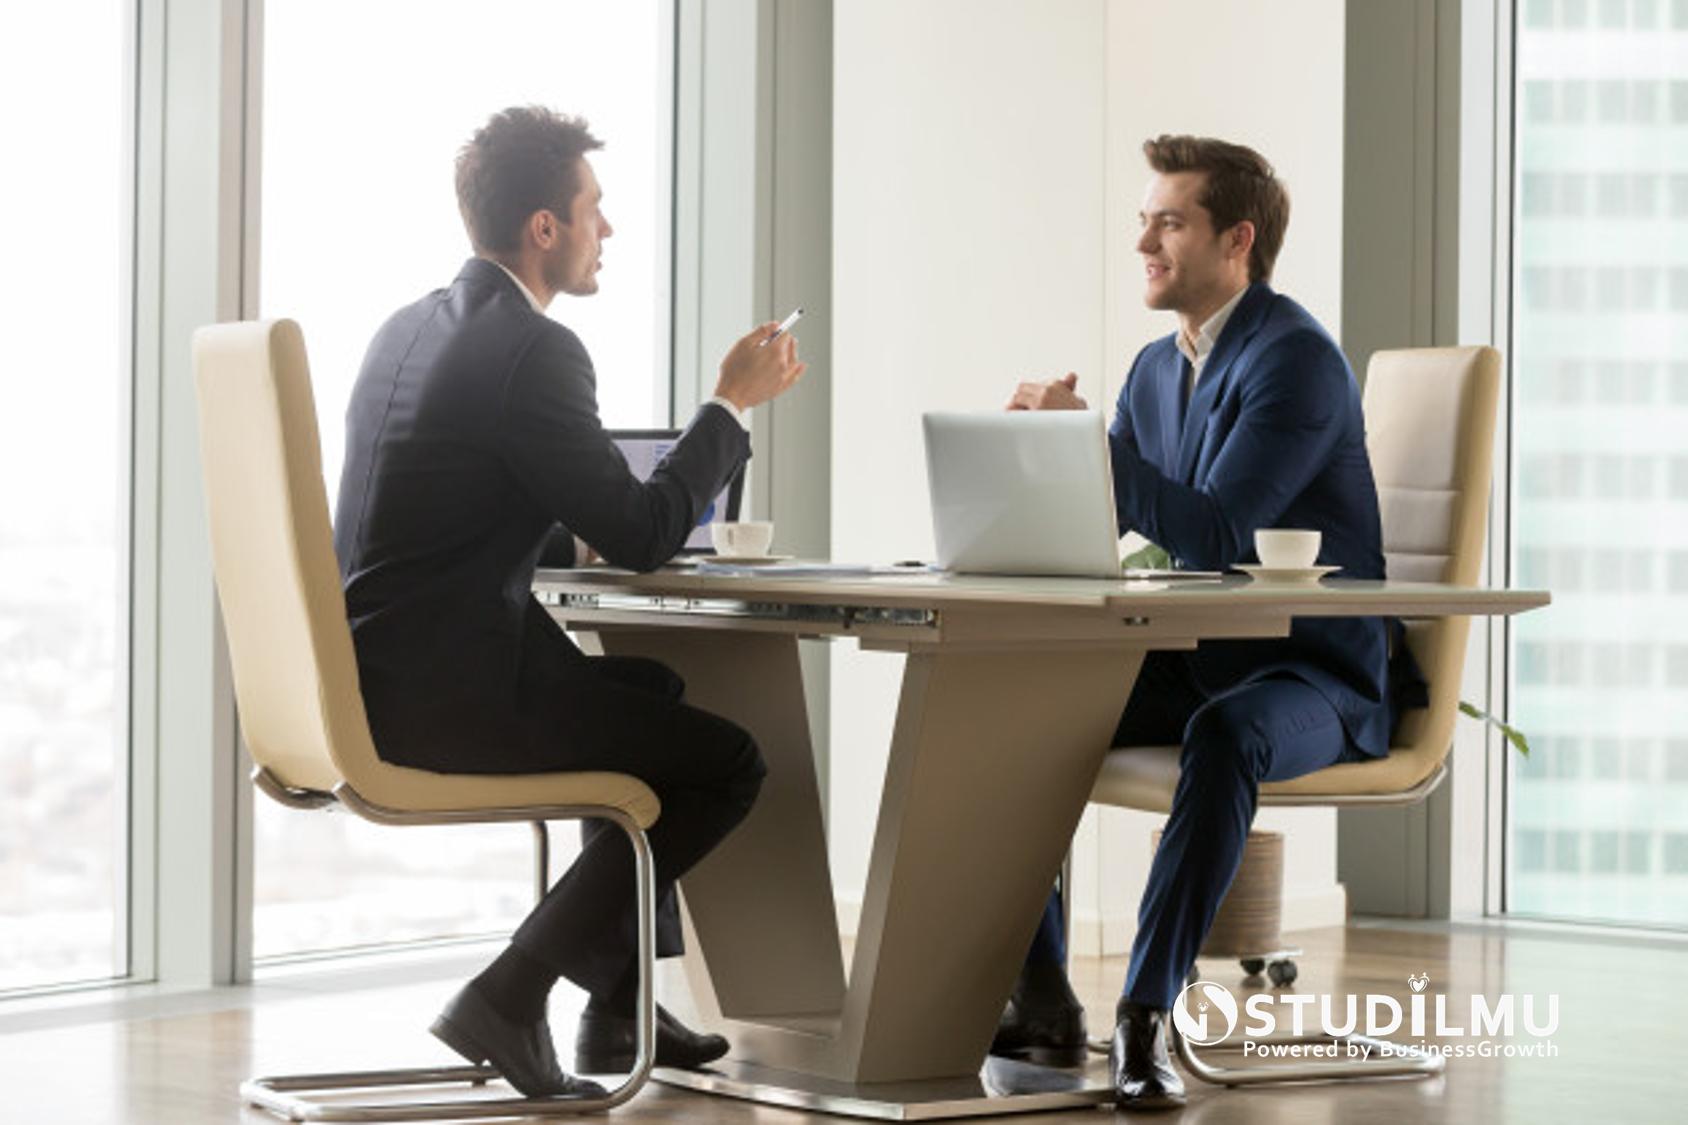 STUDILMU Career Advice - Pemimpin, Hentikan Perilaku Ini